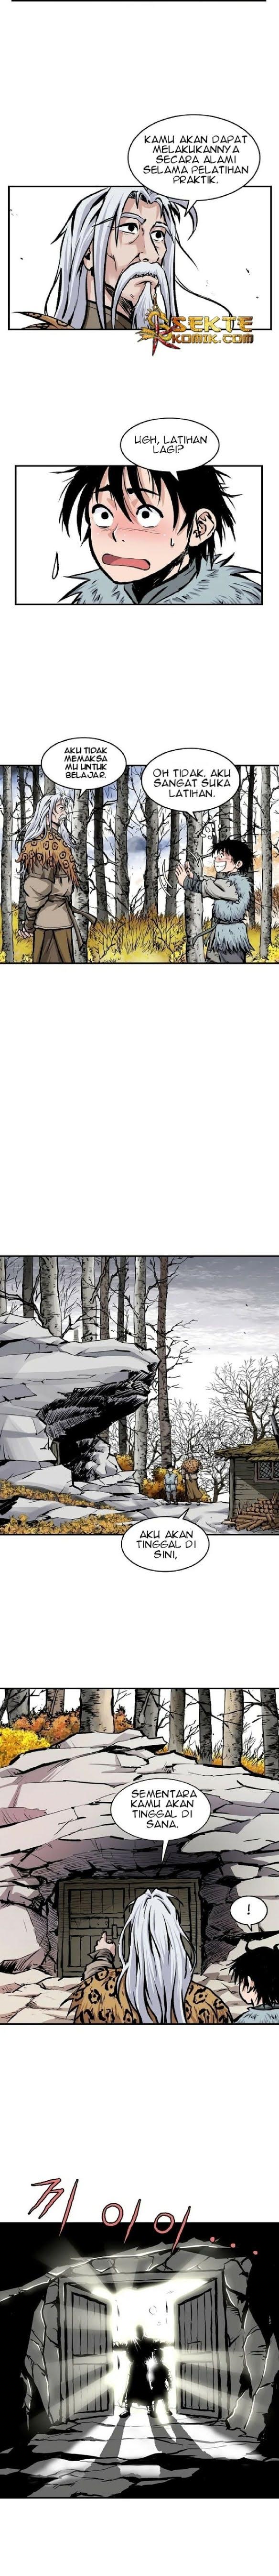 Bowblade Spirit Chapter 3